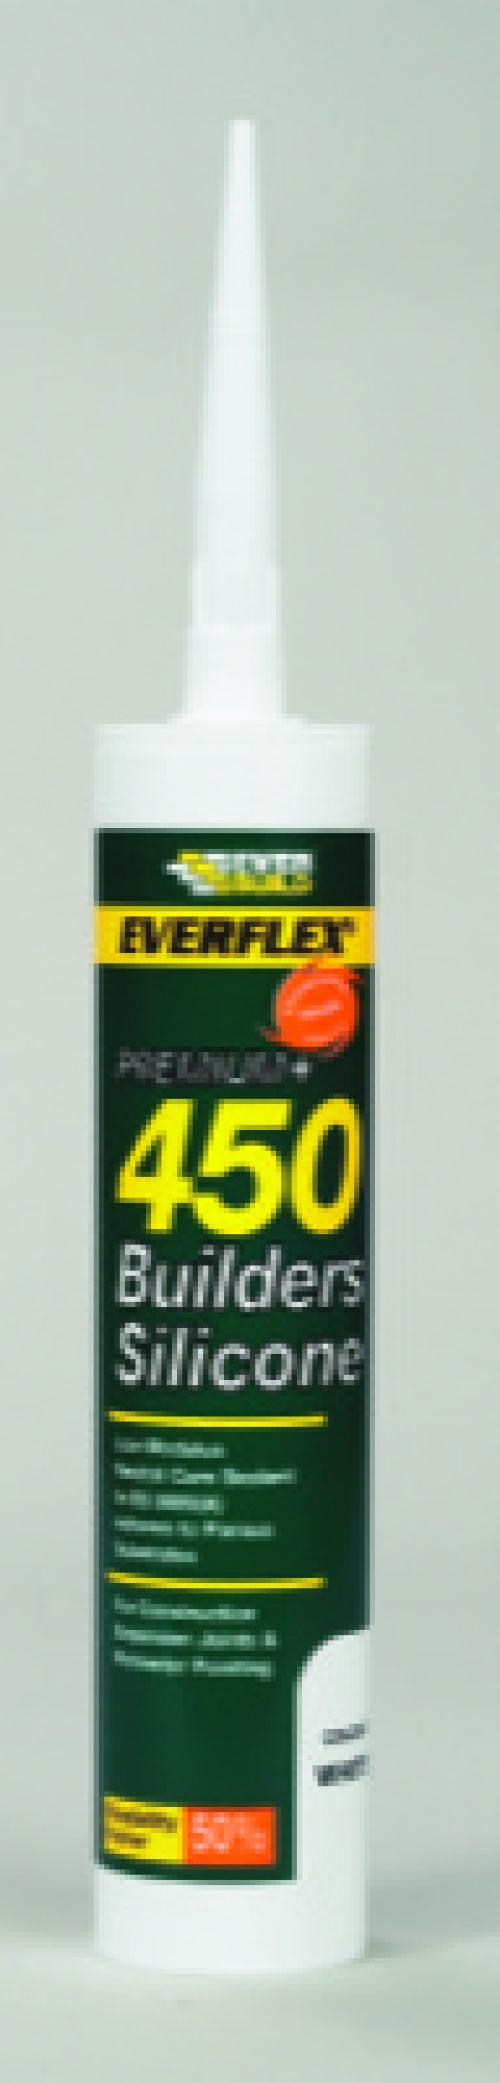 Builders Silicone Sealant 450